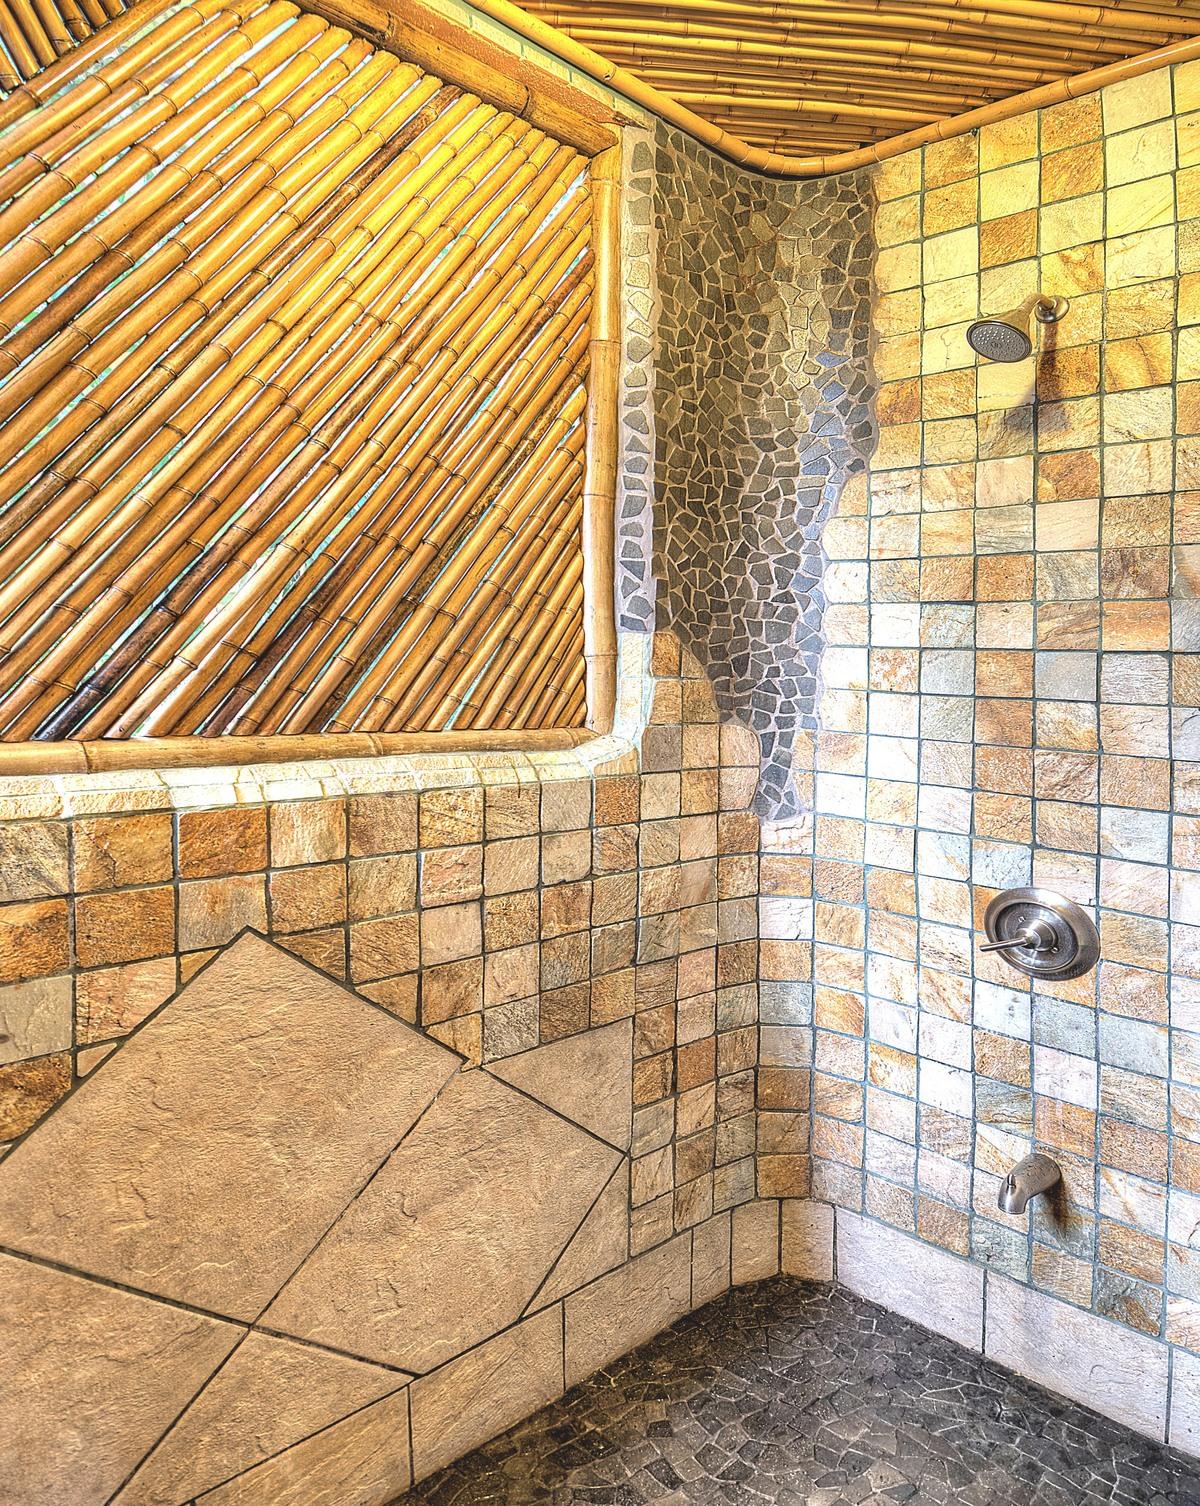 5 de 11: Master shower shows the creative details found throughout.